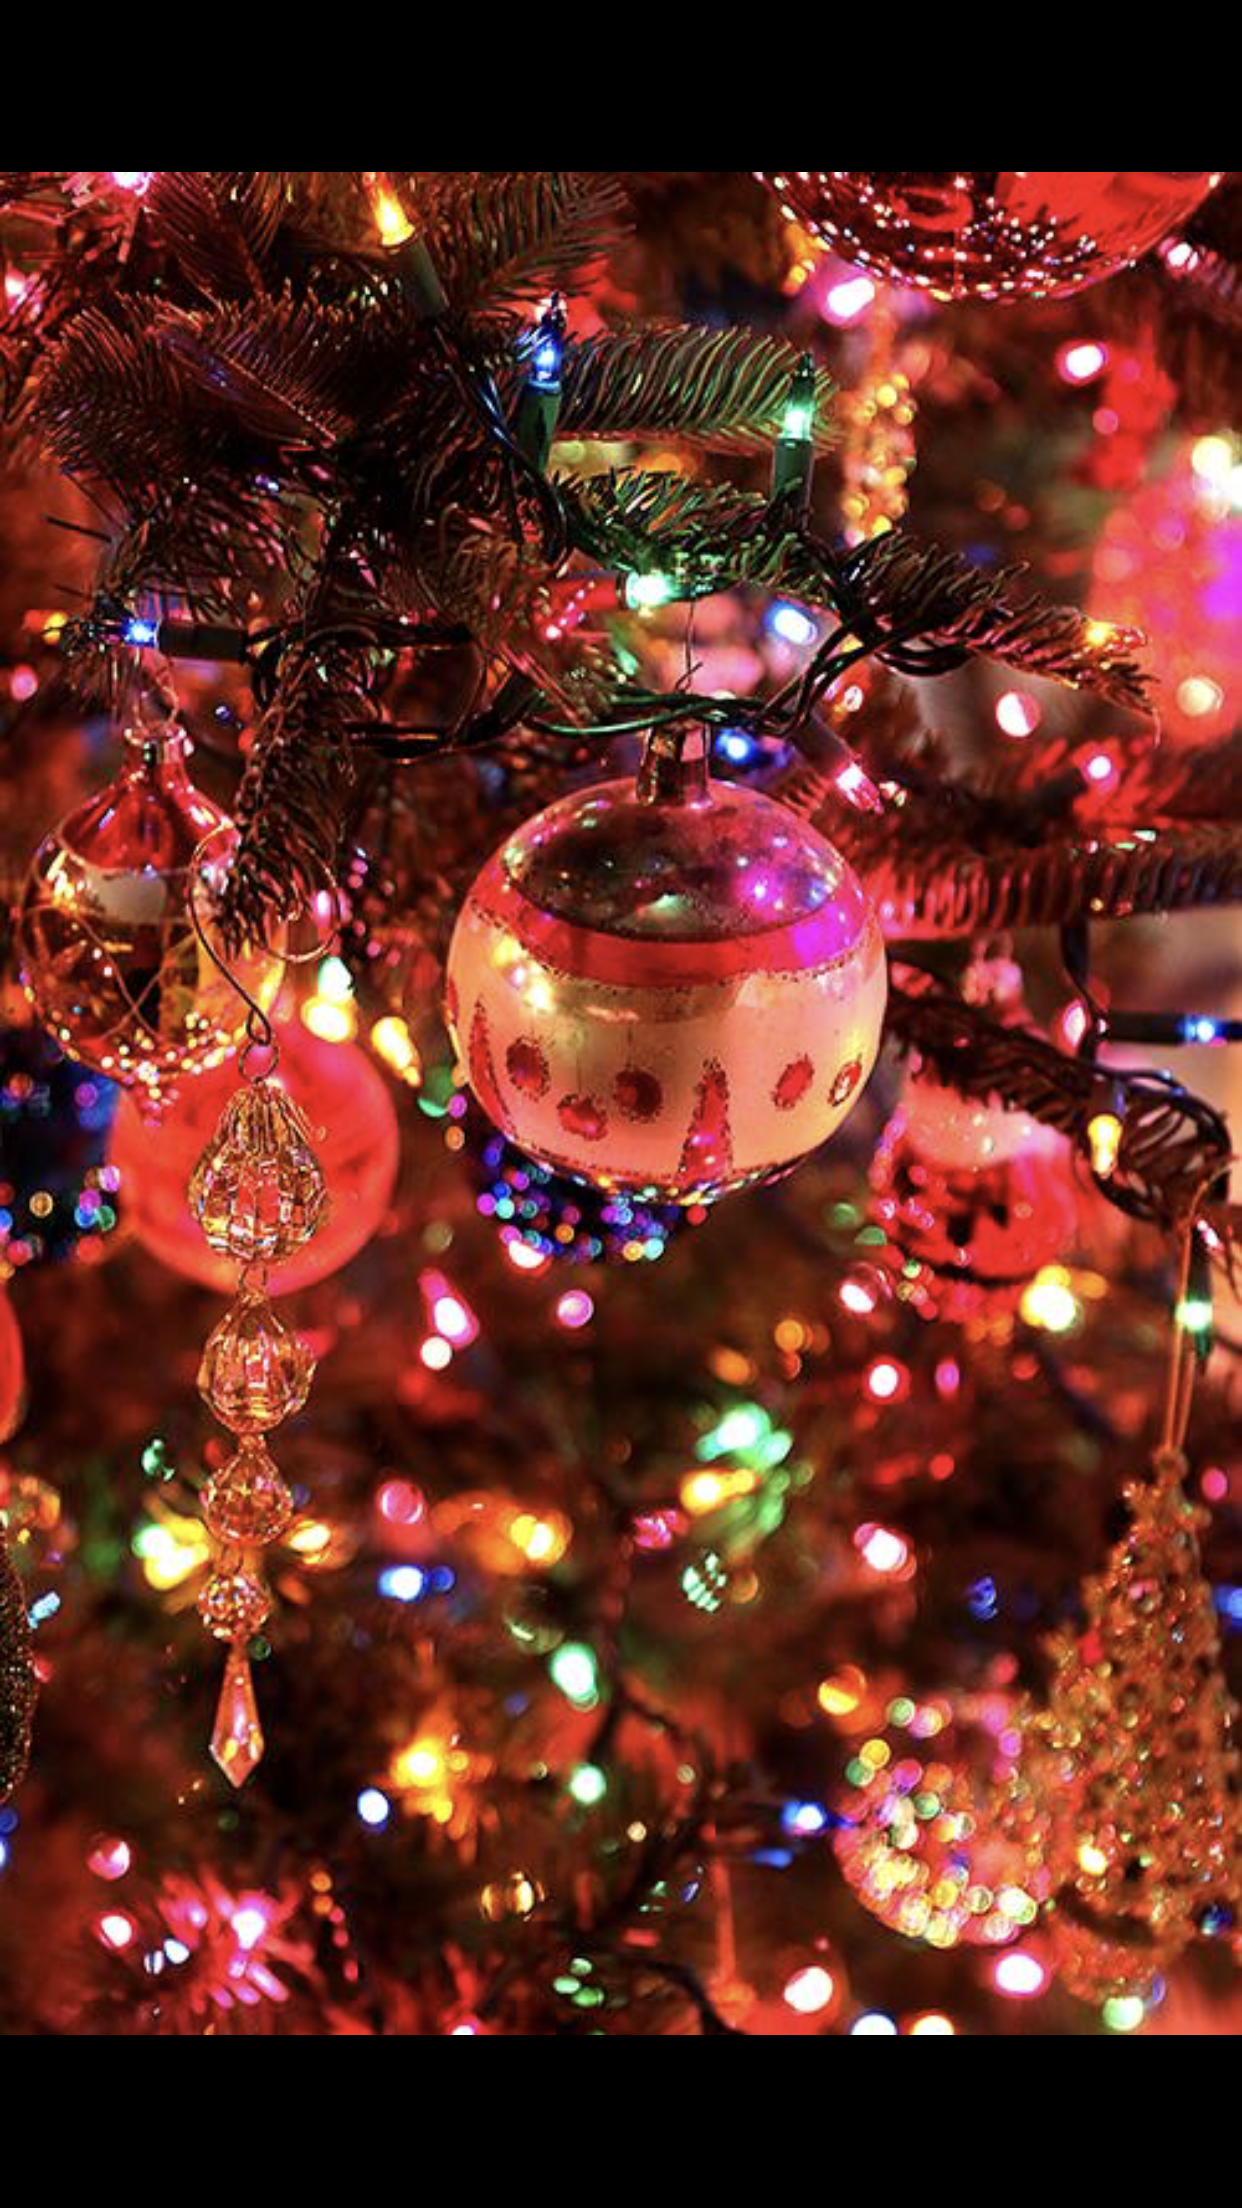 Colorful Christmas Lights Aesthetic.Christmas Tree Lights Decorations การตกแต งเทศกาลคร สต มาส